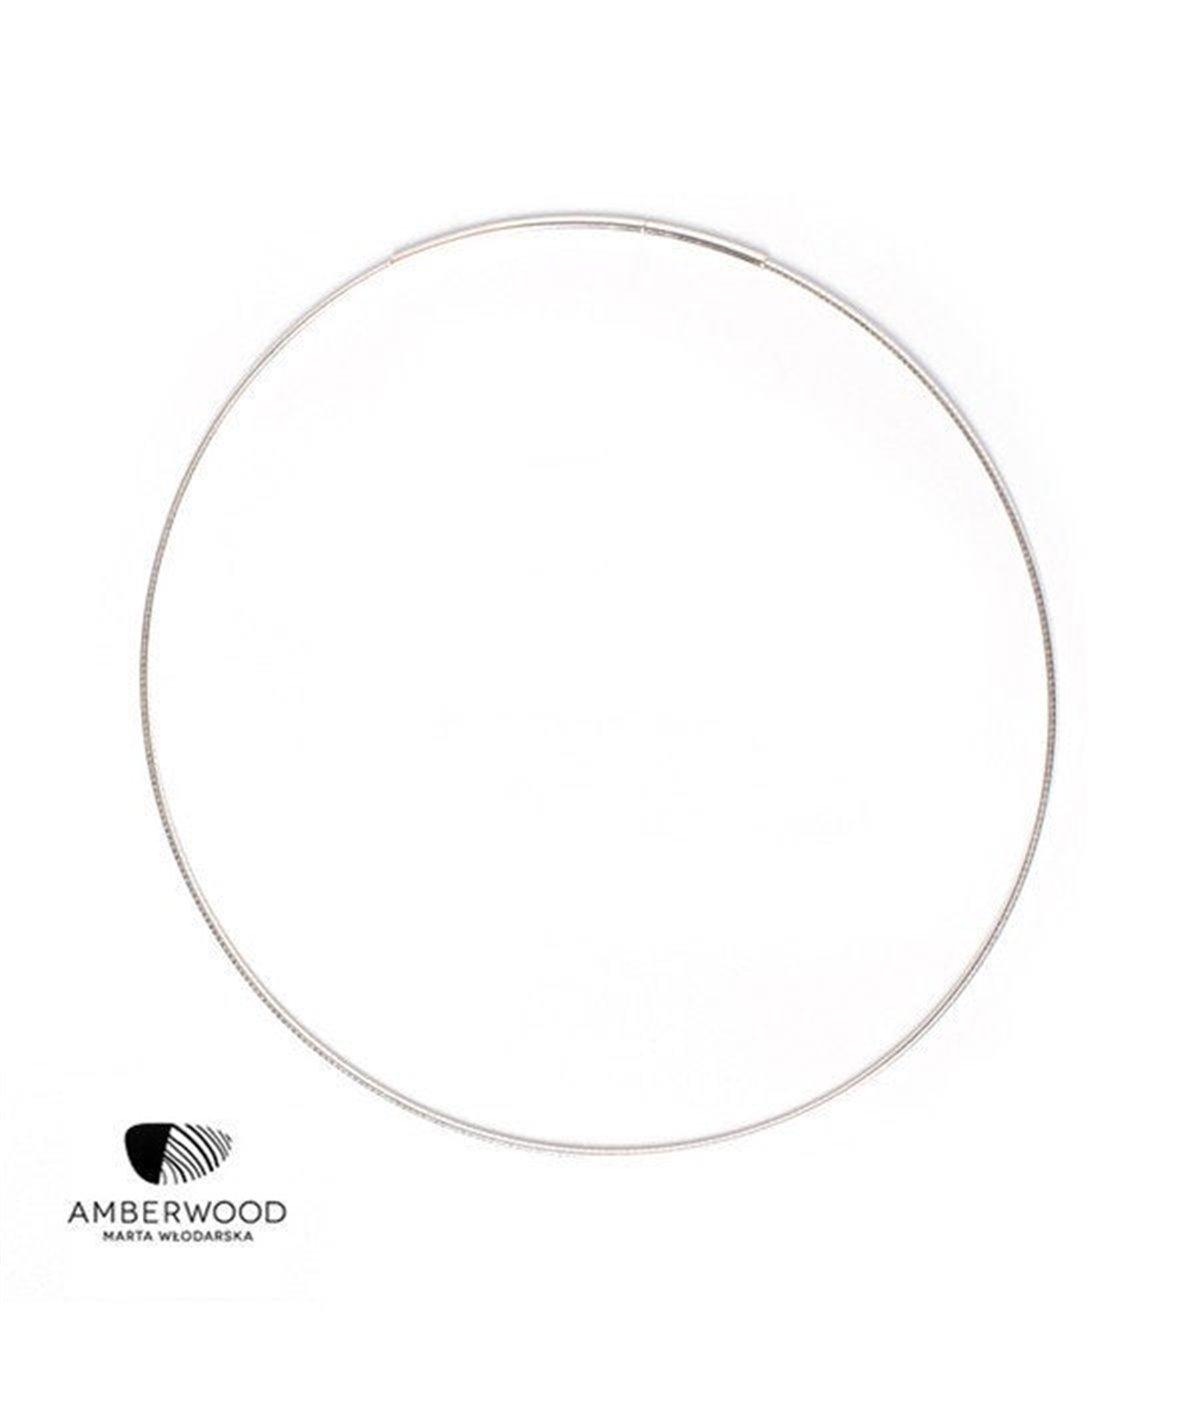 Amberwood Choker Collar Sterling Silver, 1.2 or 2.2mm